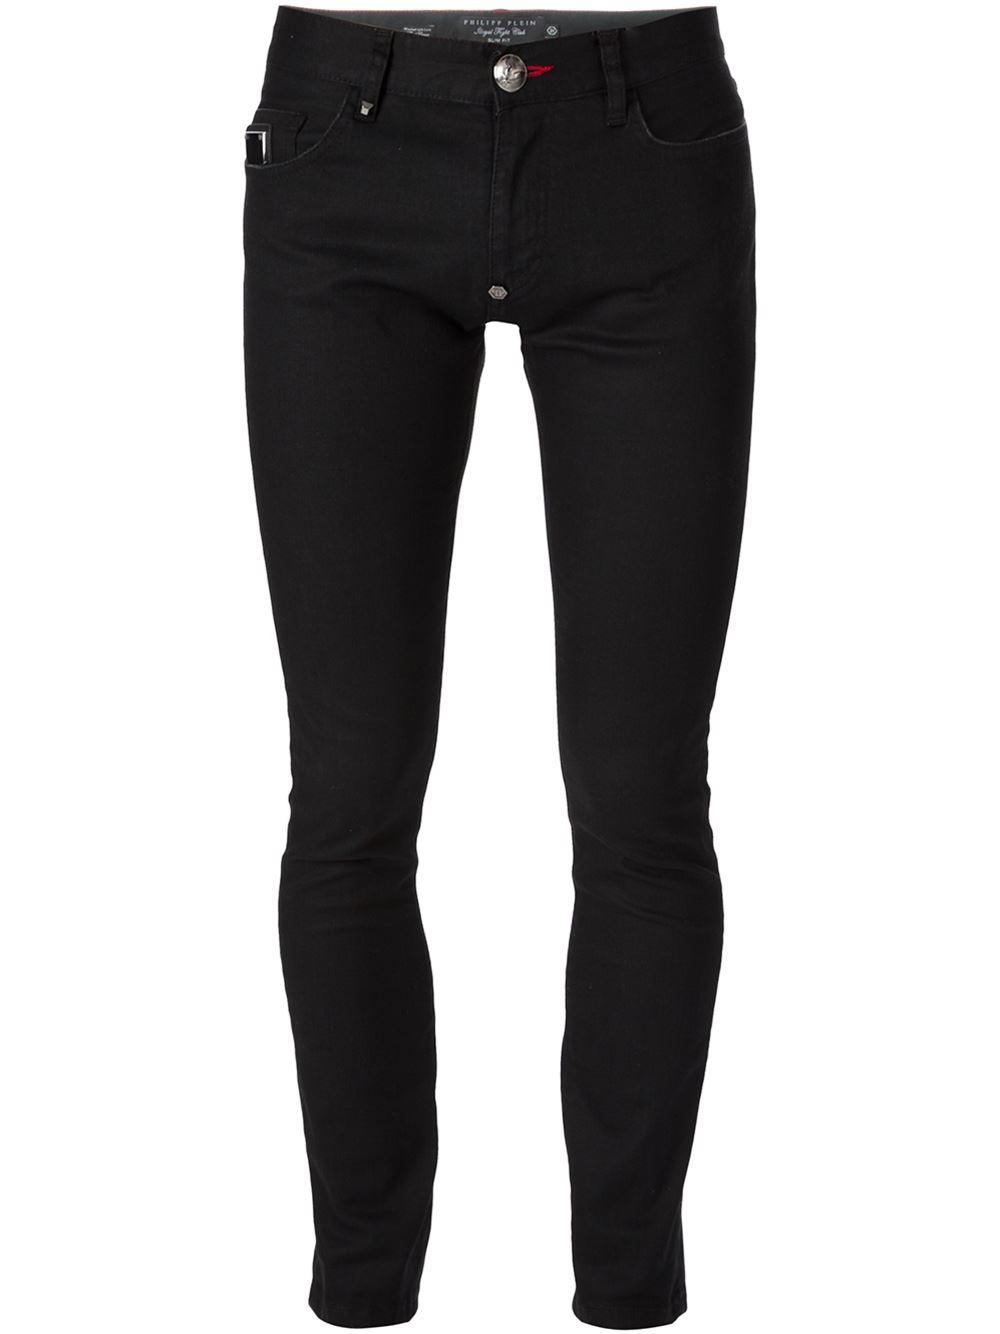 philipp plein skinny jeans in black for men. Black Bedroom Furniture Sets. Home Design Ideas